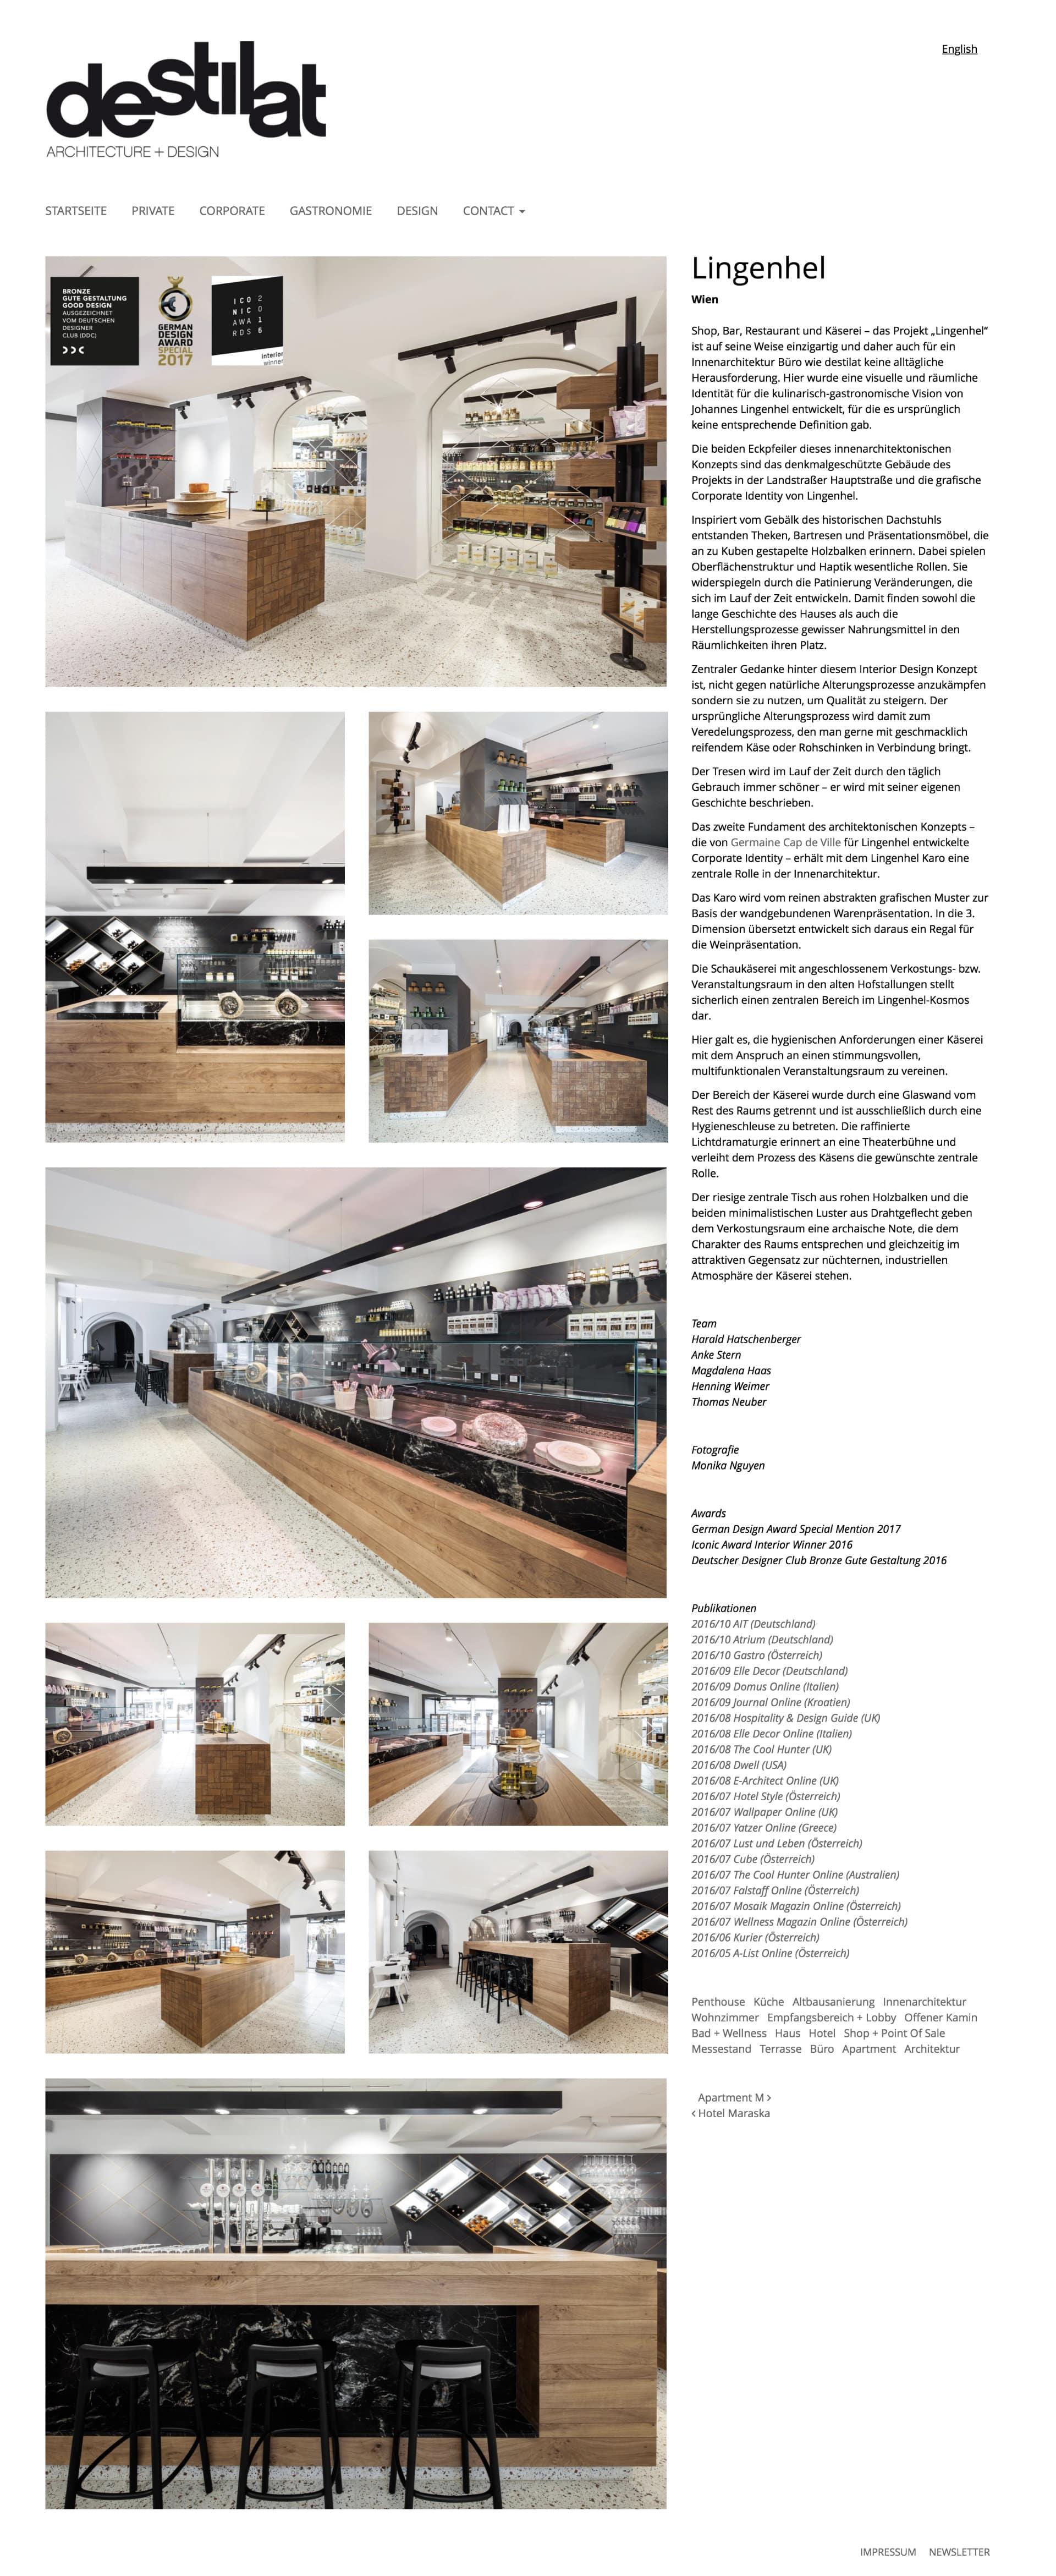 destilat Website